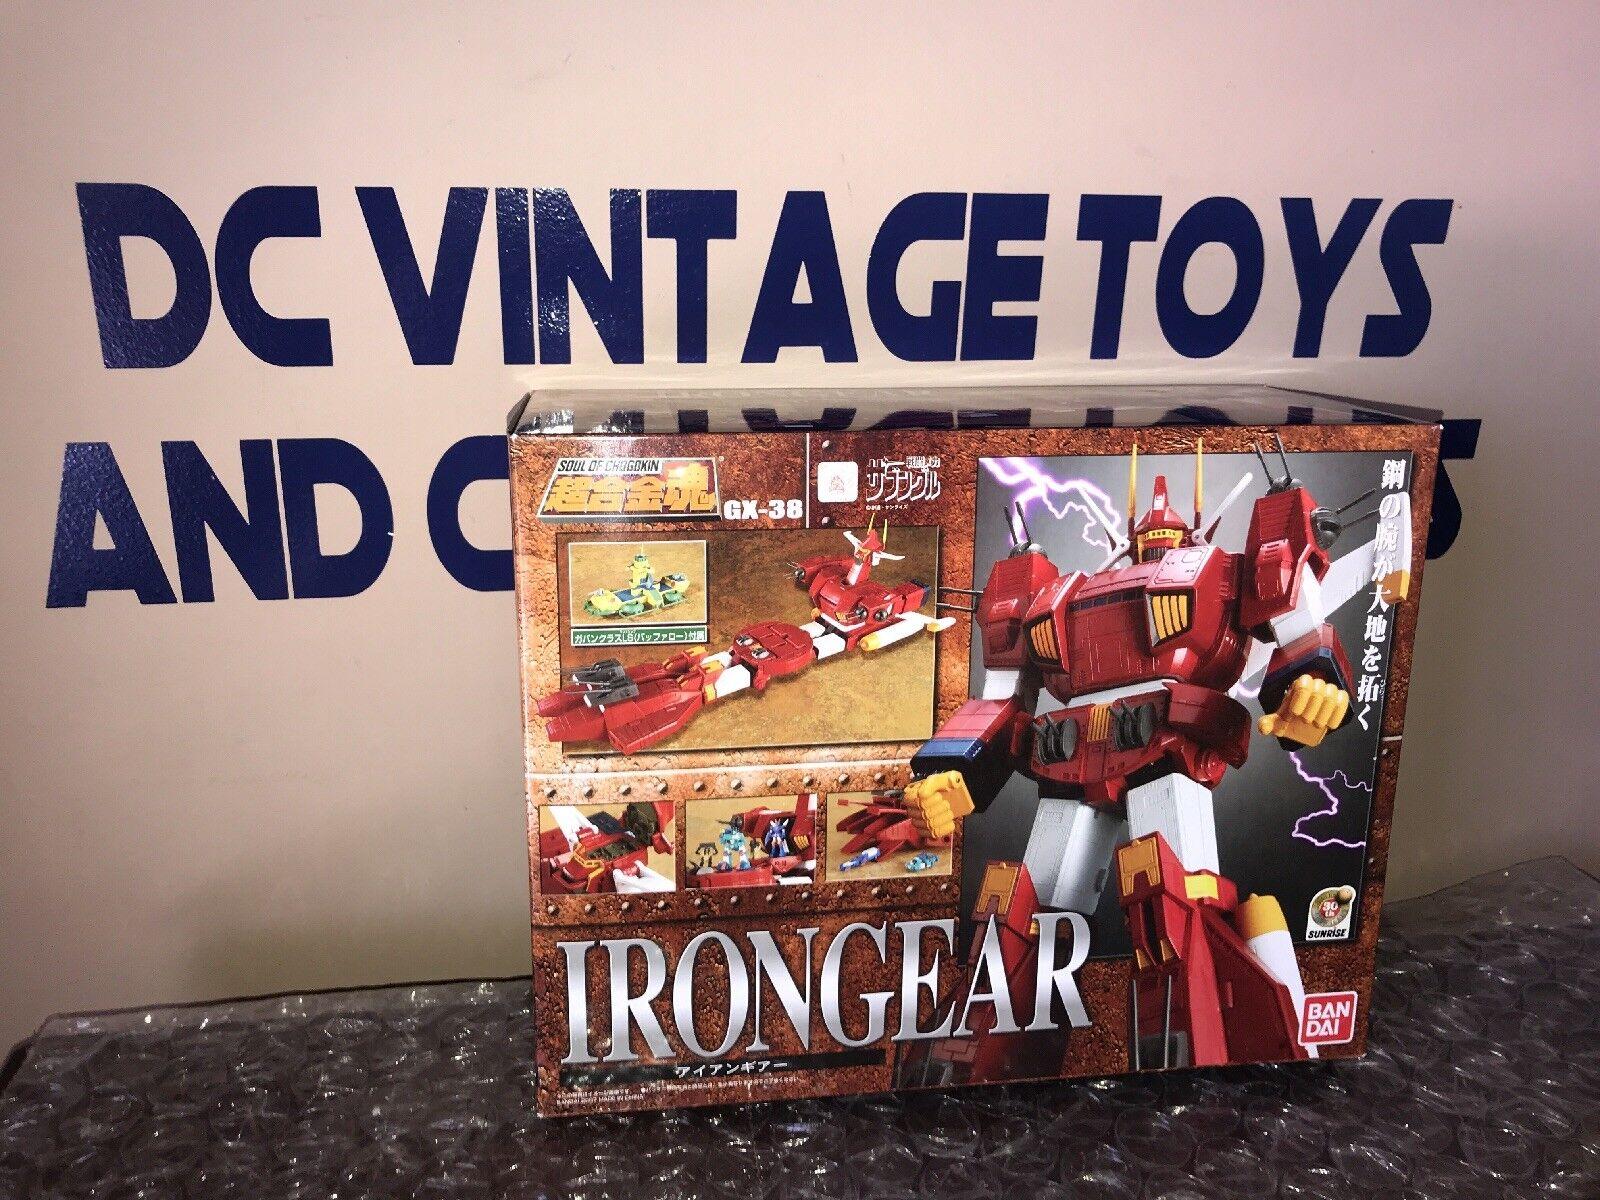 Bandai Soul of Chogokin GX-38 Iron Gear U.S.A Seller. Brand New